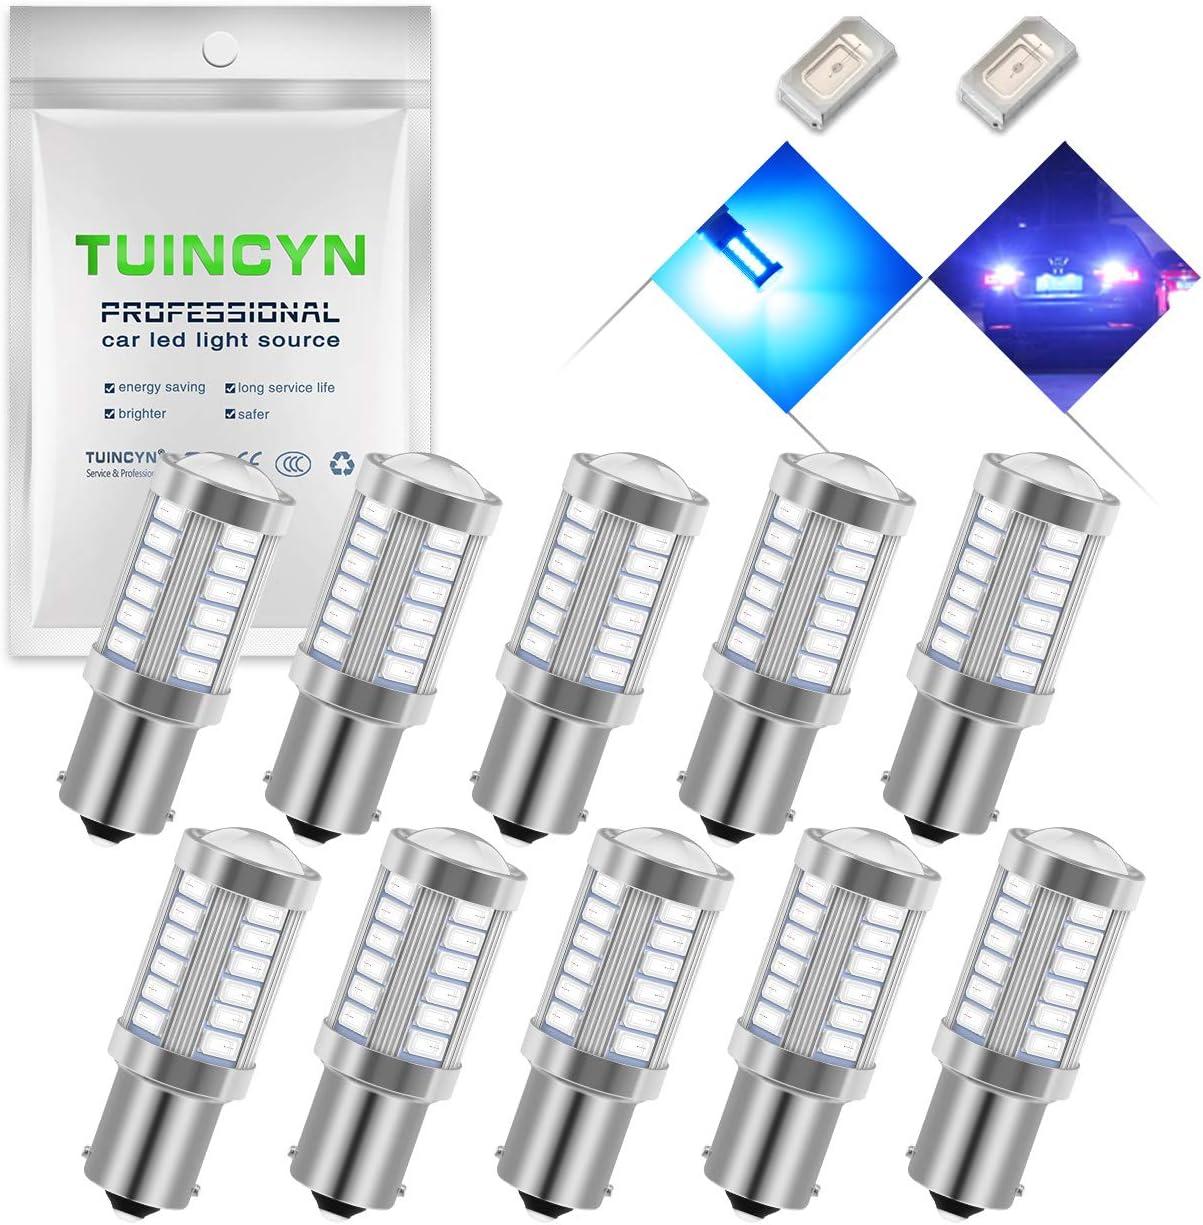 Pack of 2 TUINCYN 1156 LED Bulb Blue Brake Light Bulb Super Bright 5630 33SMD 1141 1073 7506 Tail Light Turn Signals Light Back Up Reverse Light Parking Light Side Marker Bulbs RV Light Lamp